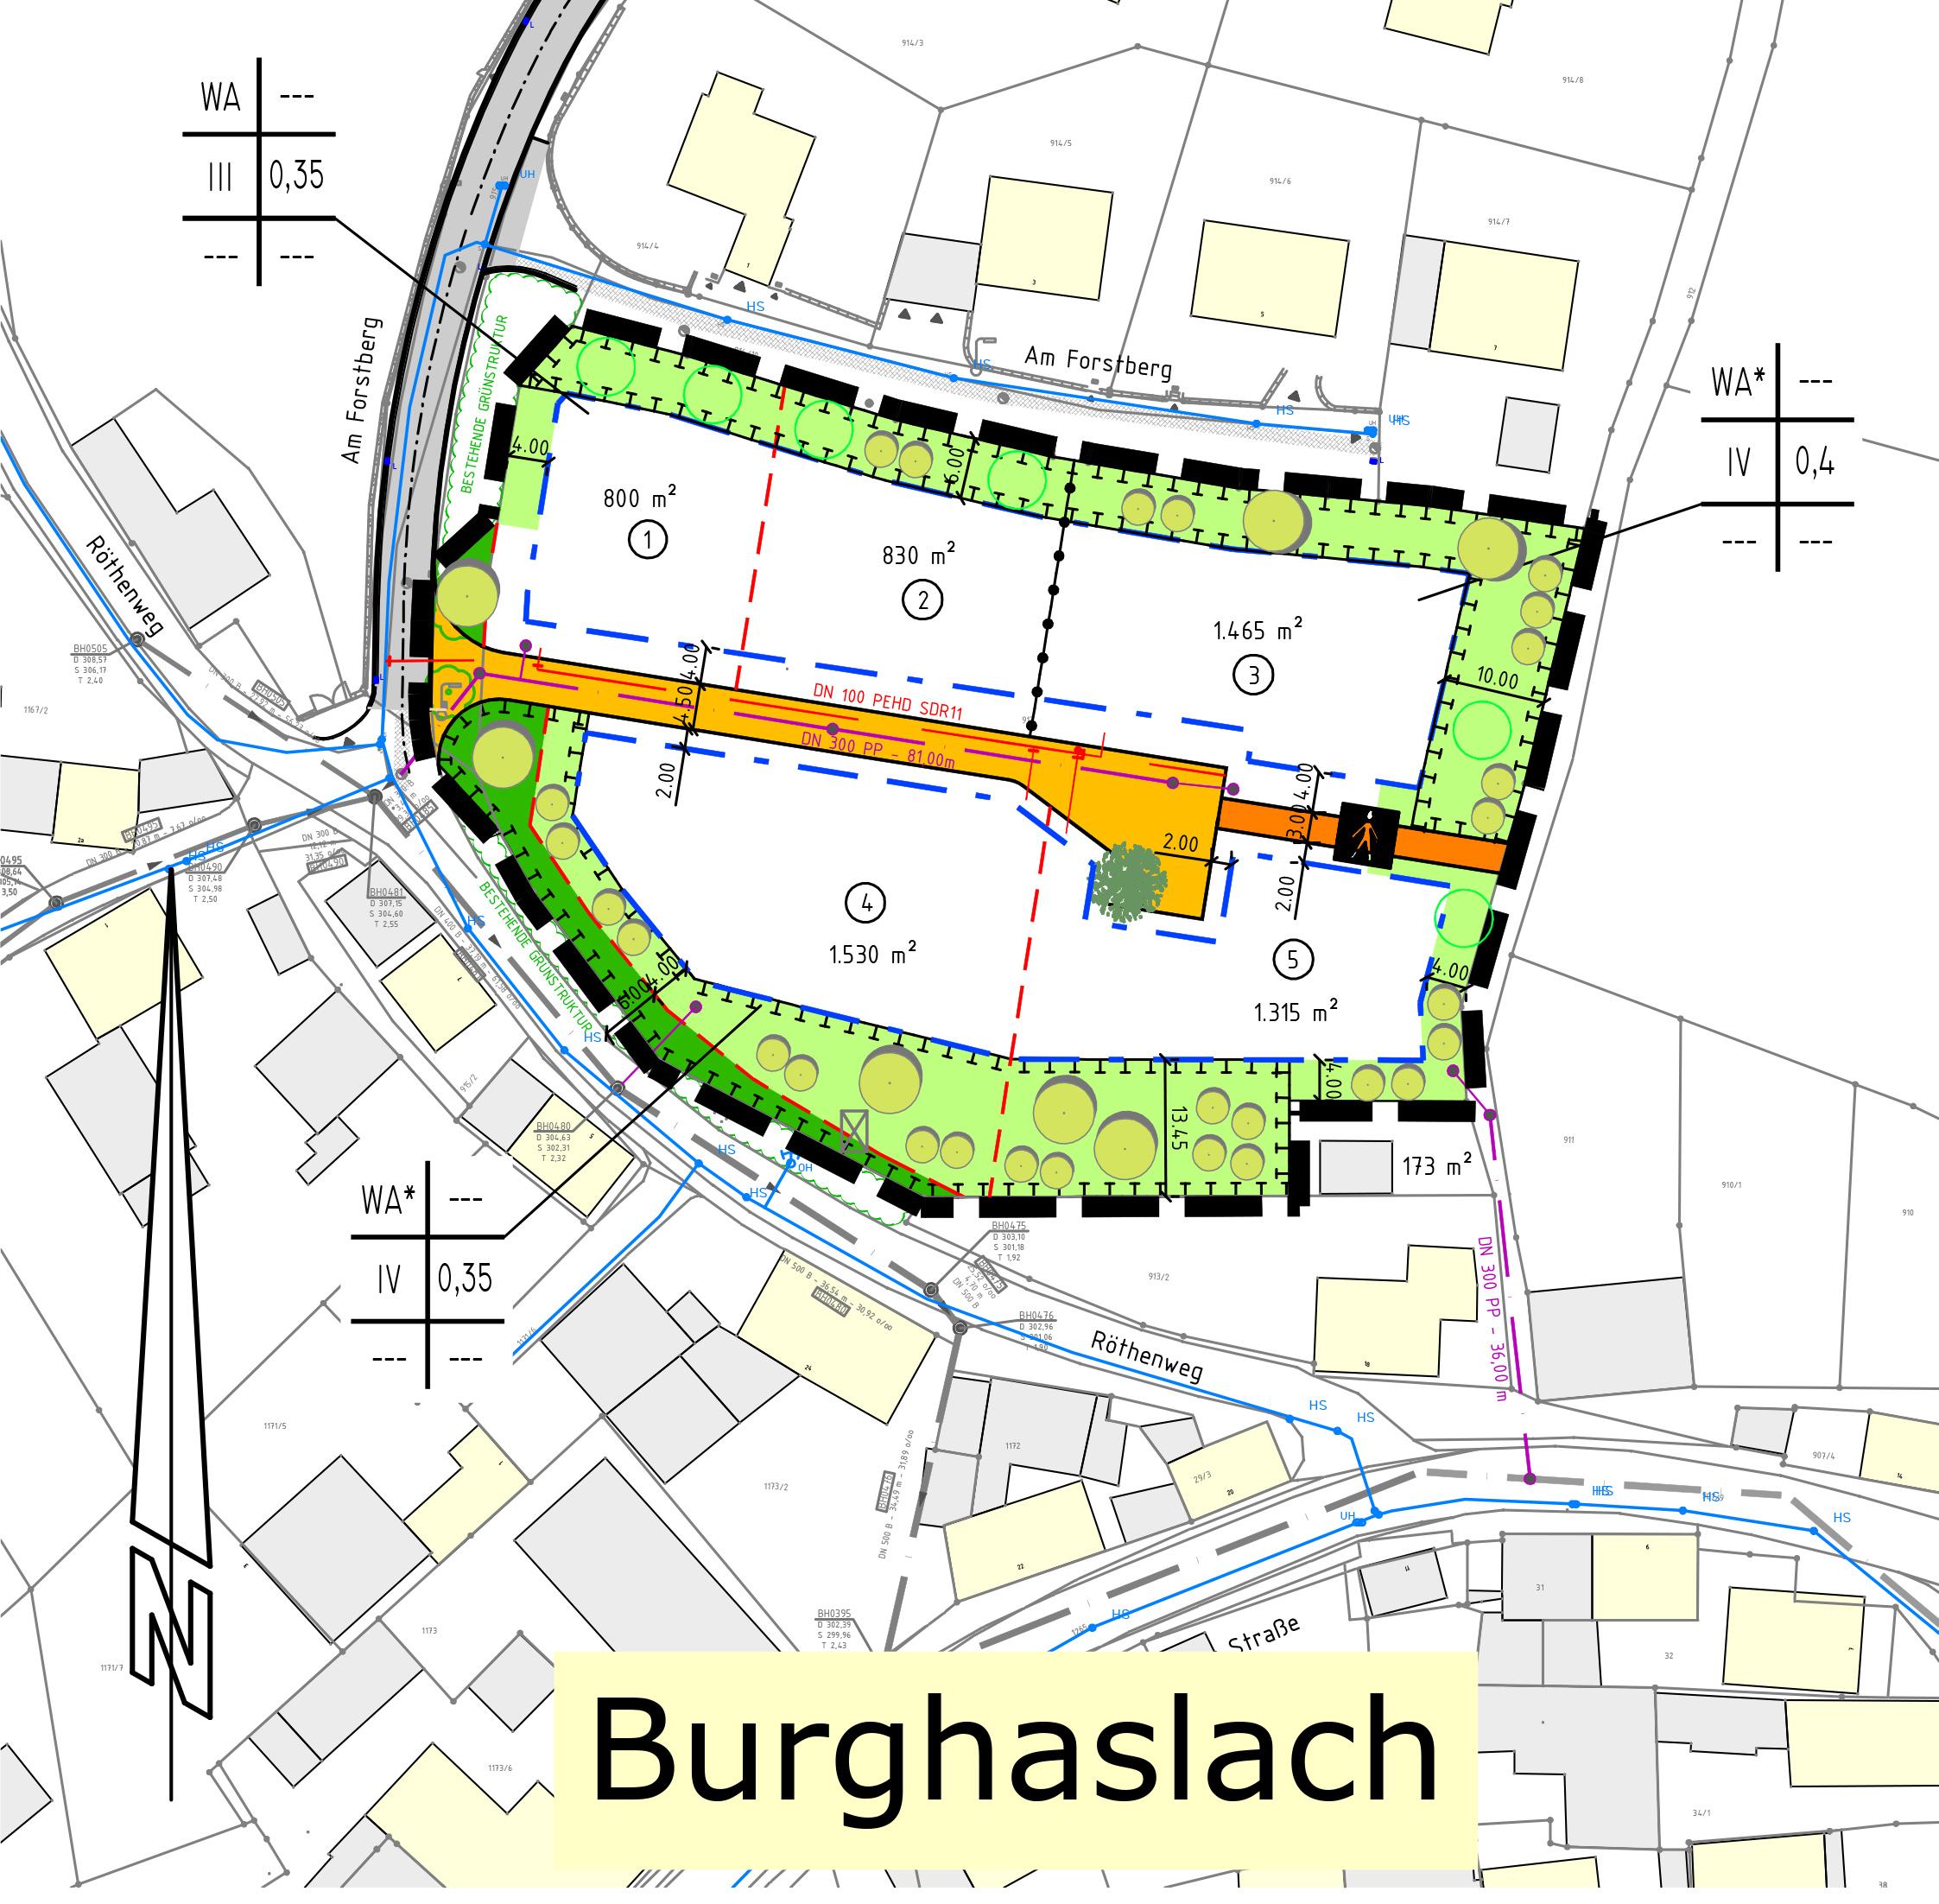 Neubaugebiet Am Forstberg